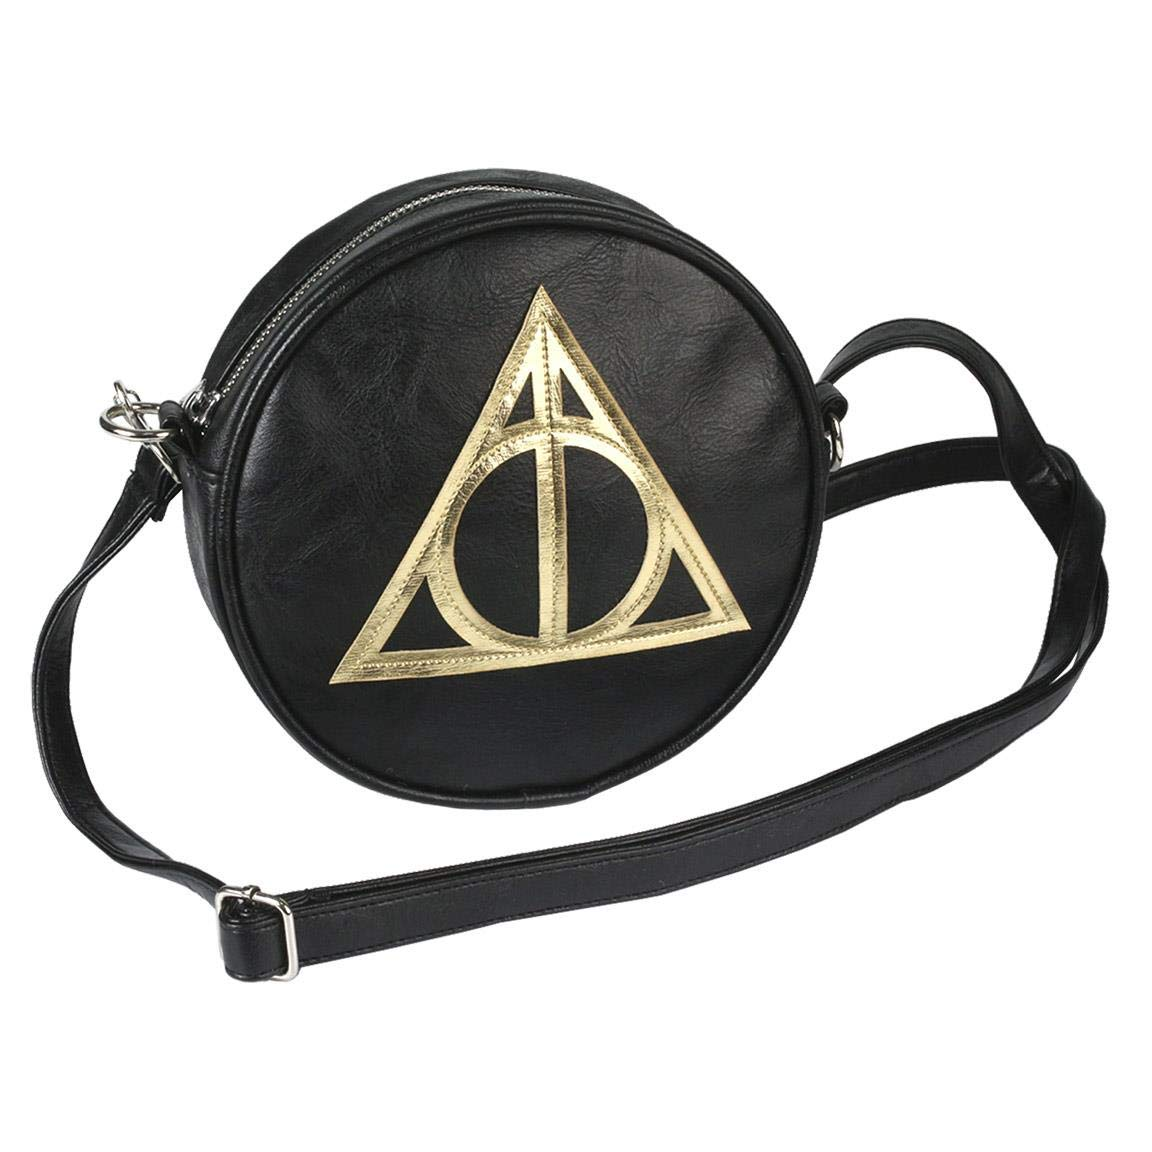 Cerdá Harry Potter Bolso Bandolera, 18 cm, Negro Cerdá 2100002372